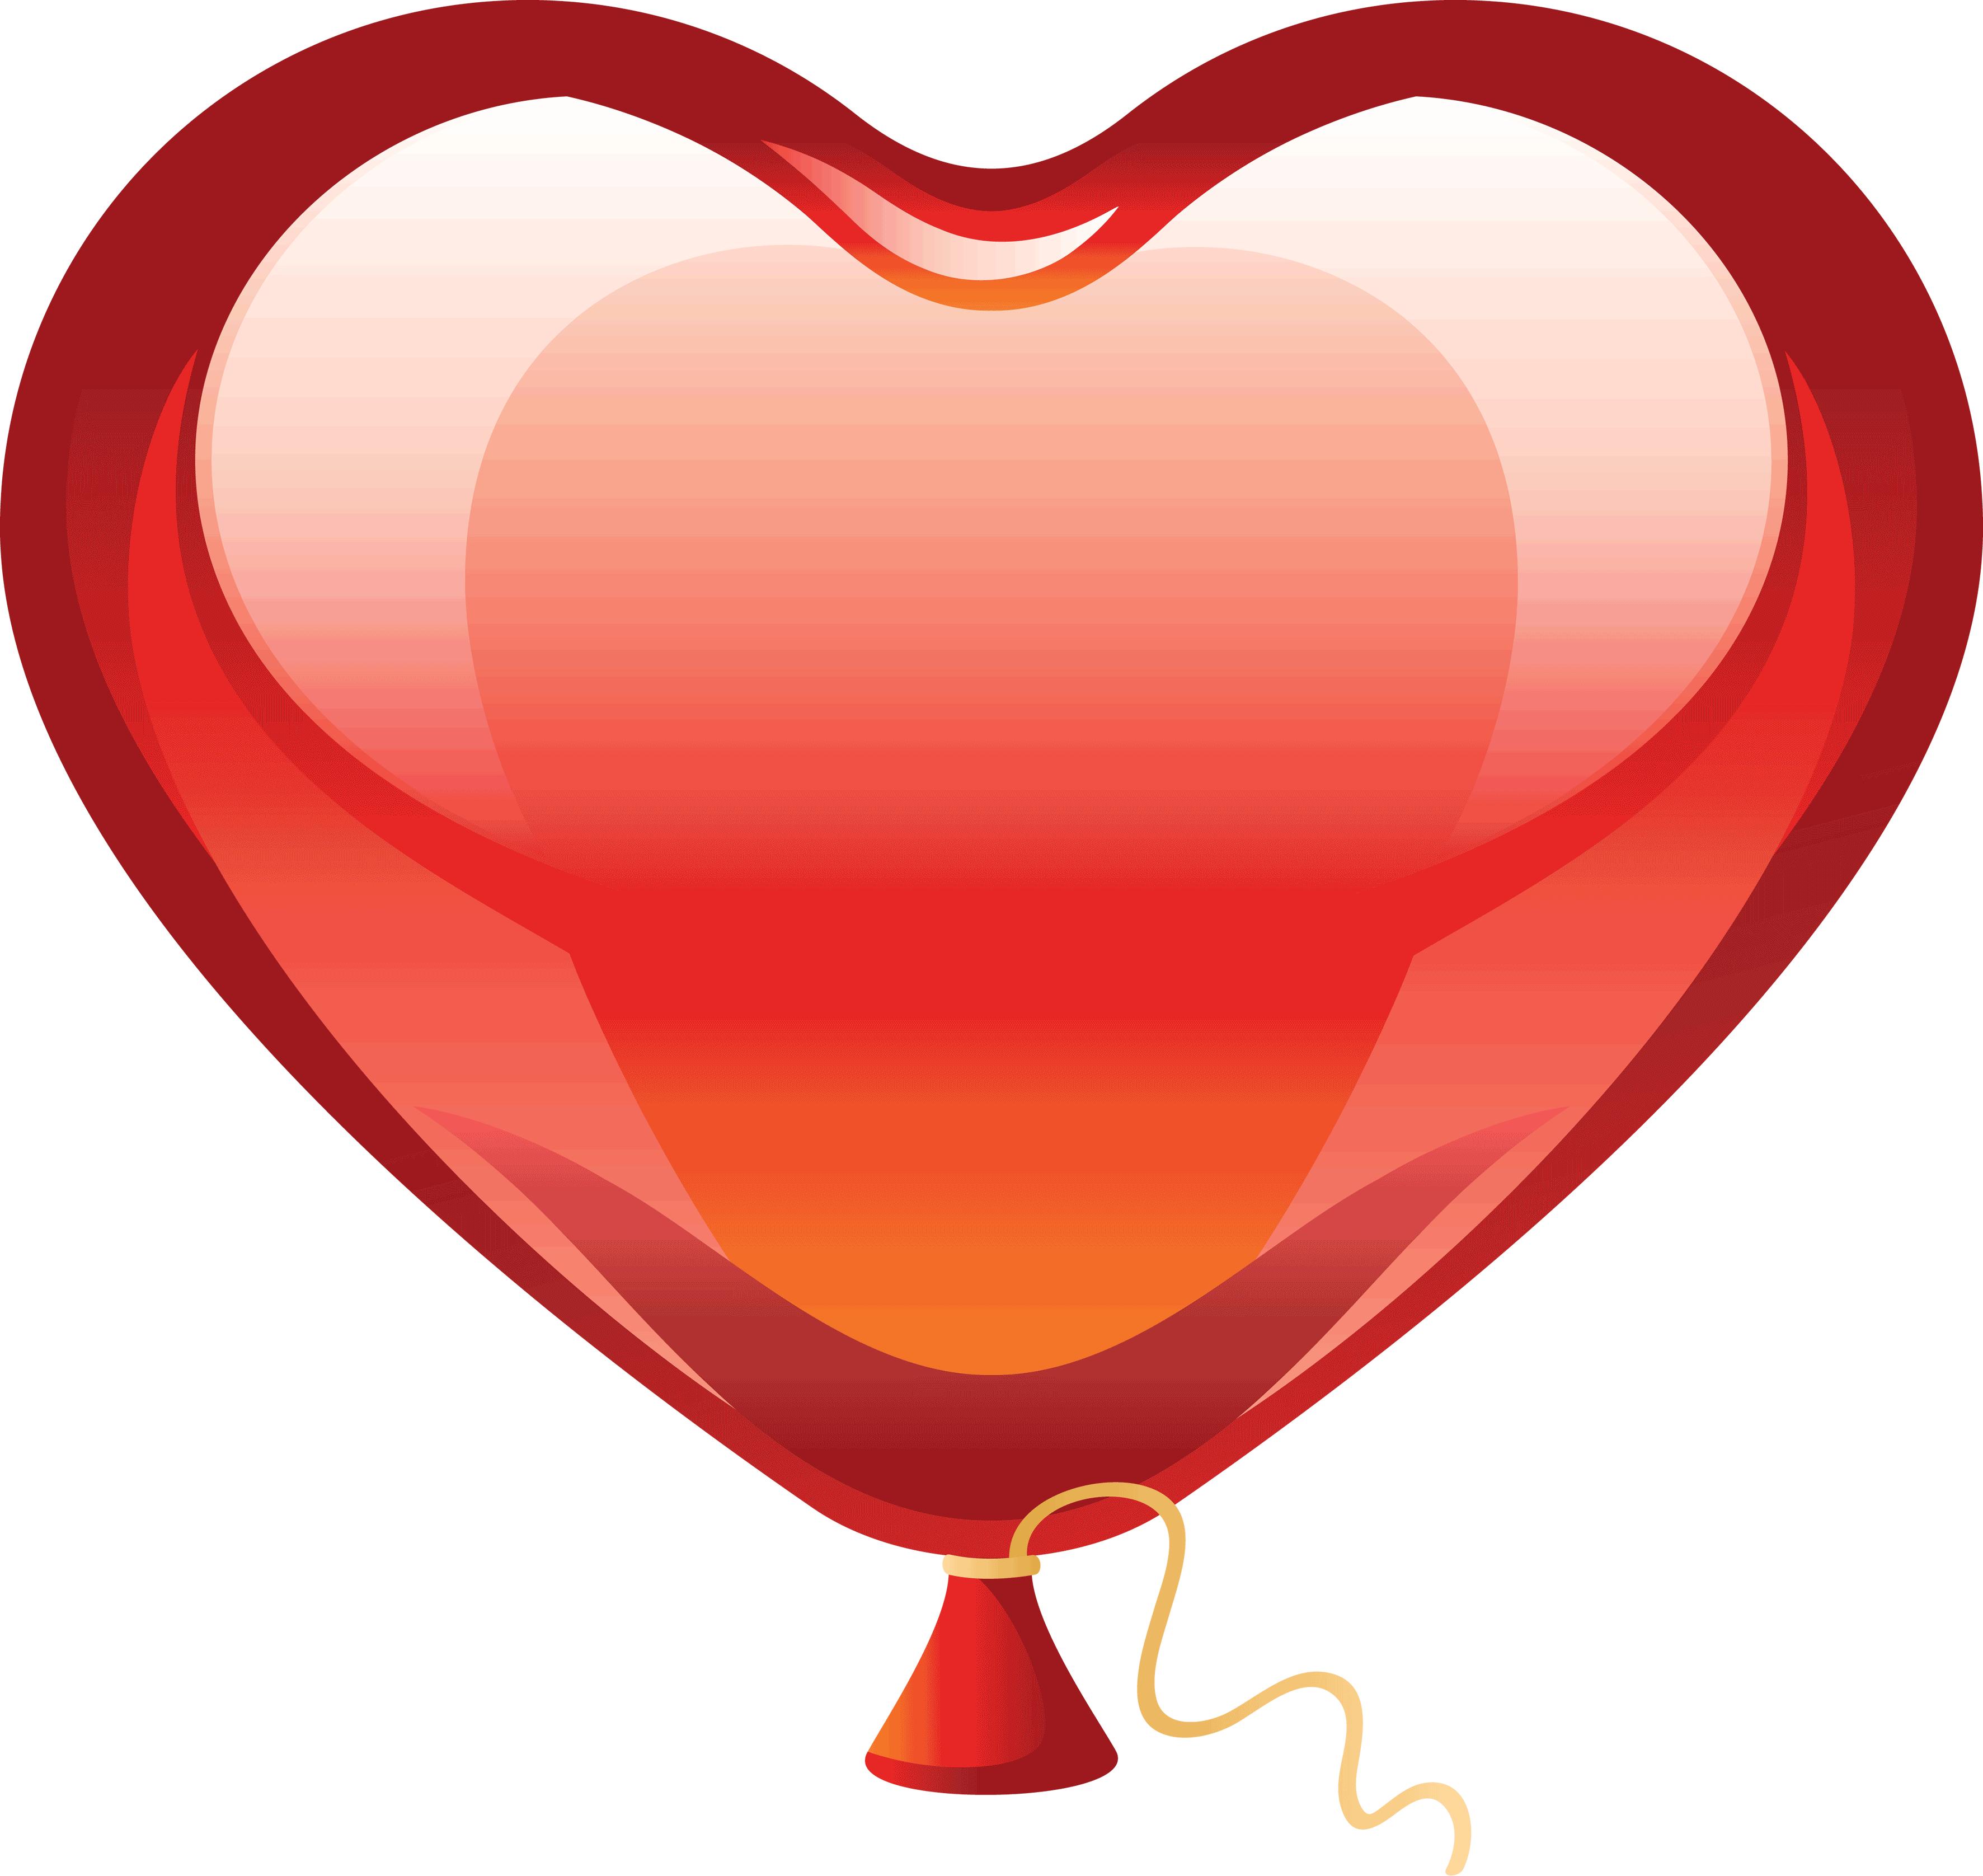 Heart balloon clipart svg royalty free stock Heart Png Clipart Balloon svg royalty free stock